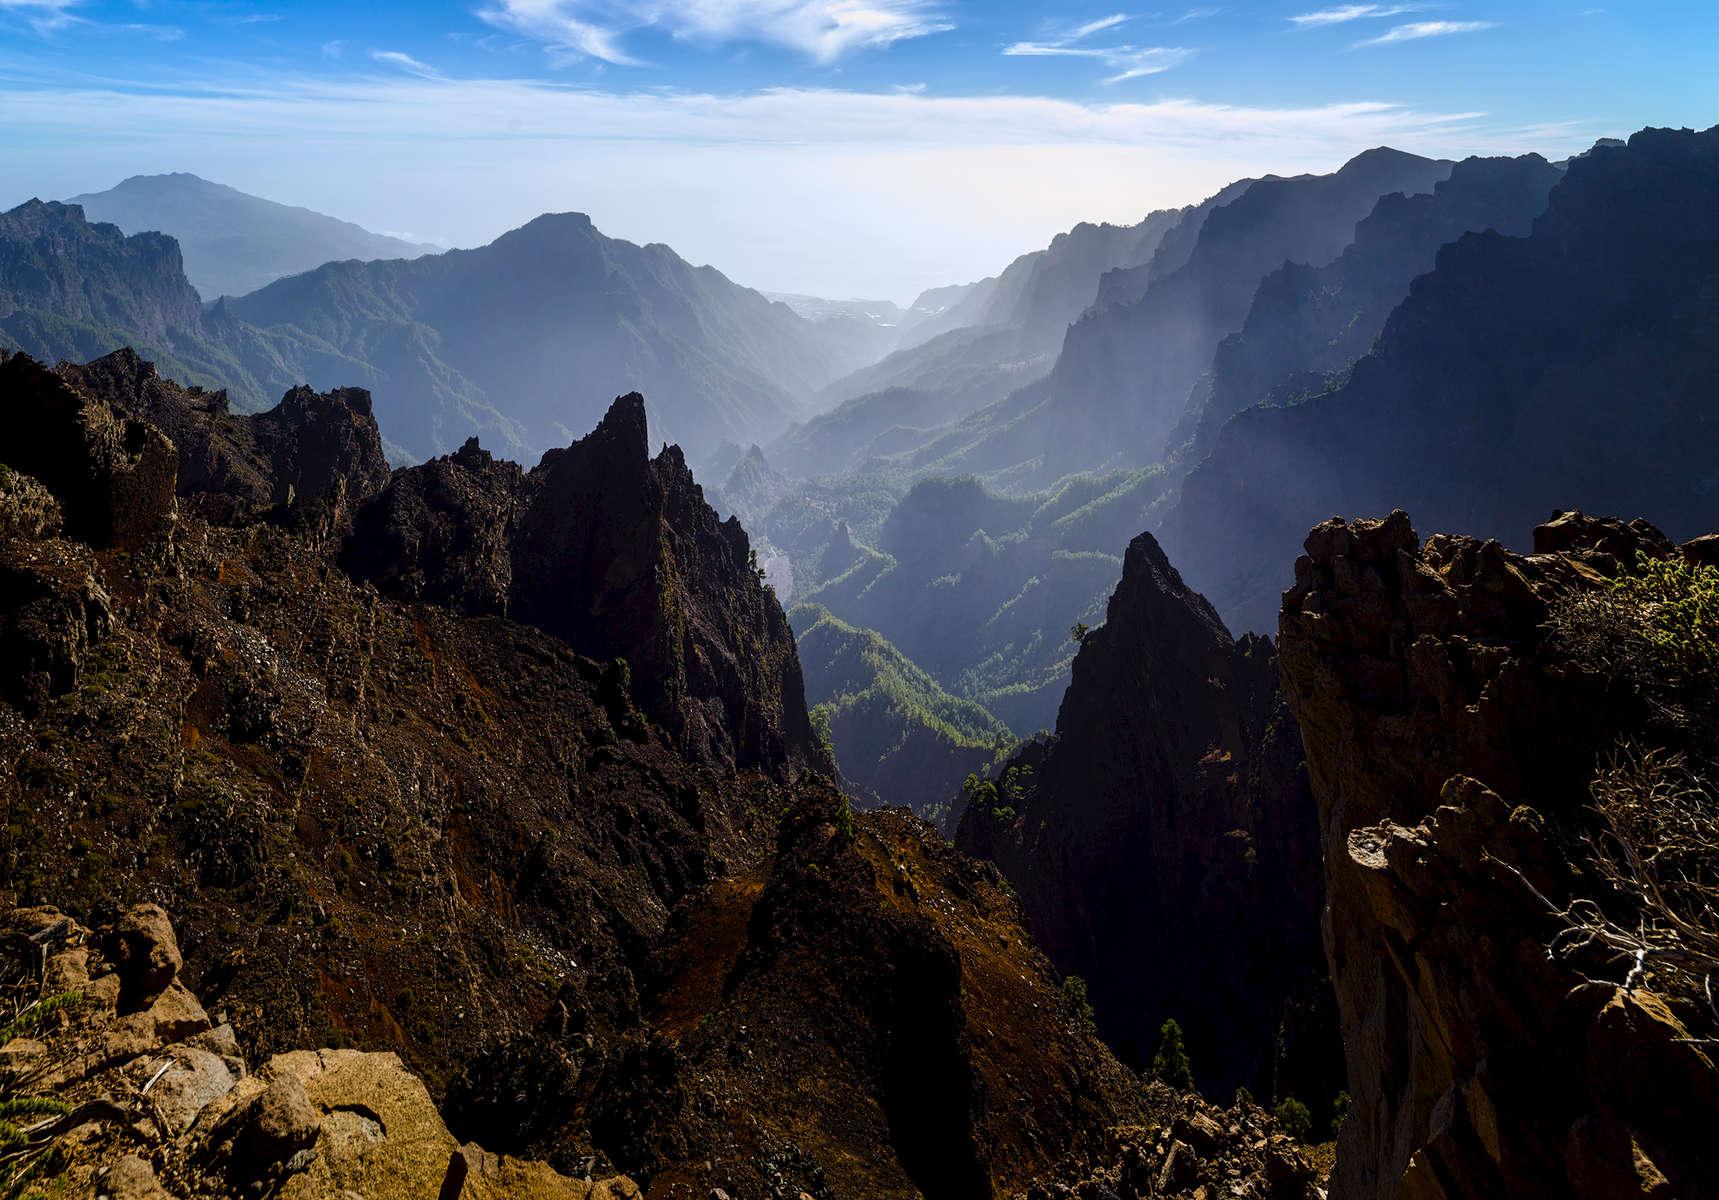 Caldera de Taburiente National Park, La Palma